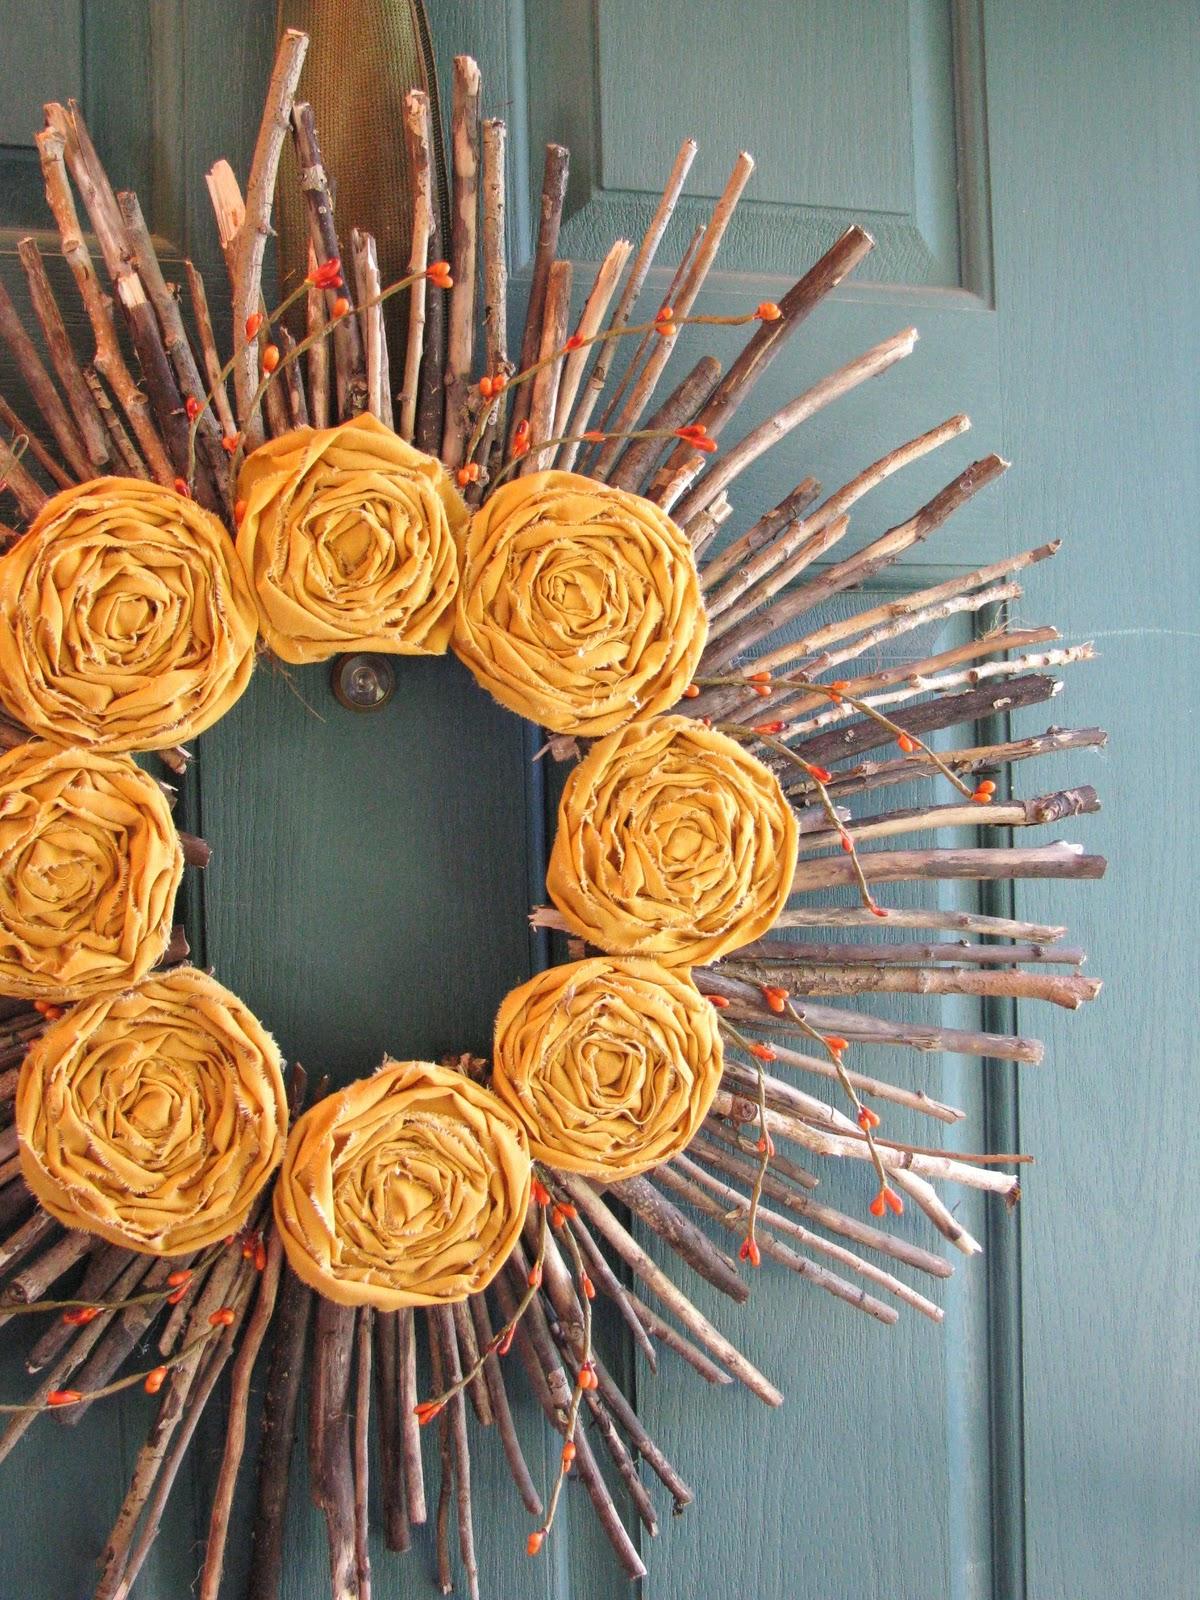 Fabryka kwiat w witaj szko o back to school craft for Herbstschmuck basteln